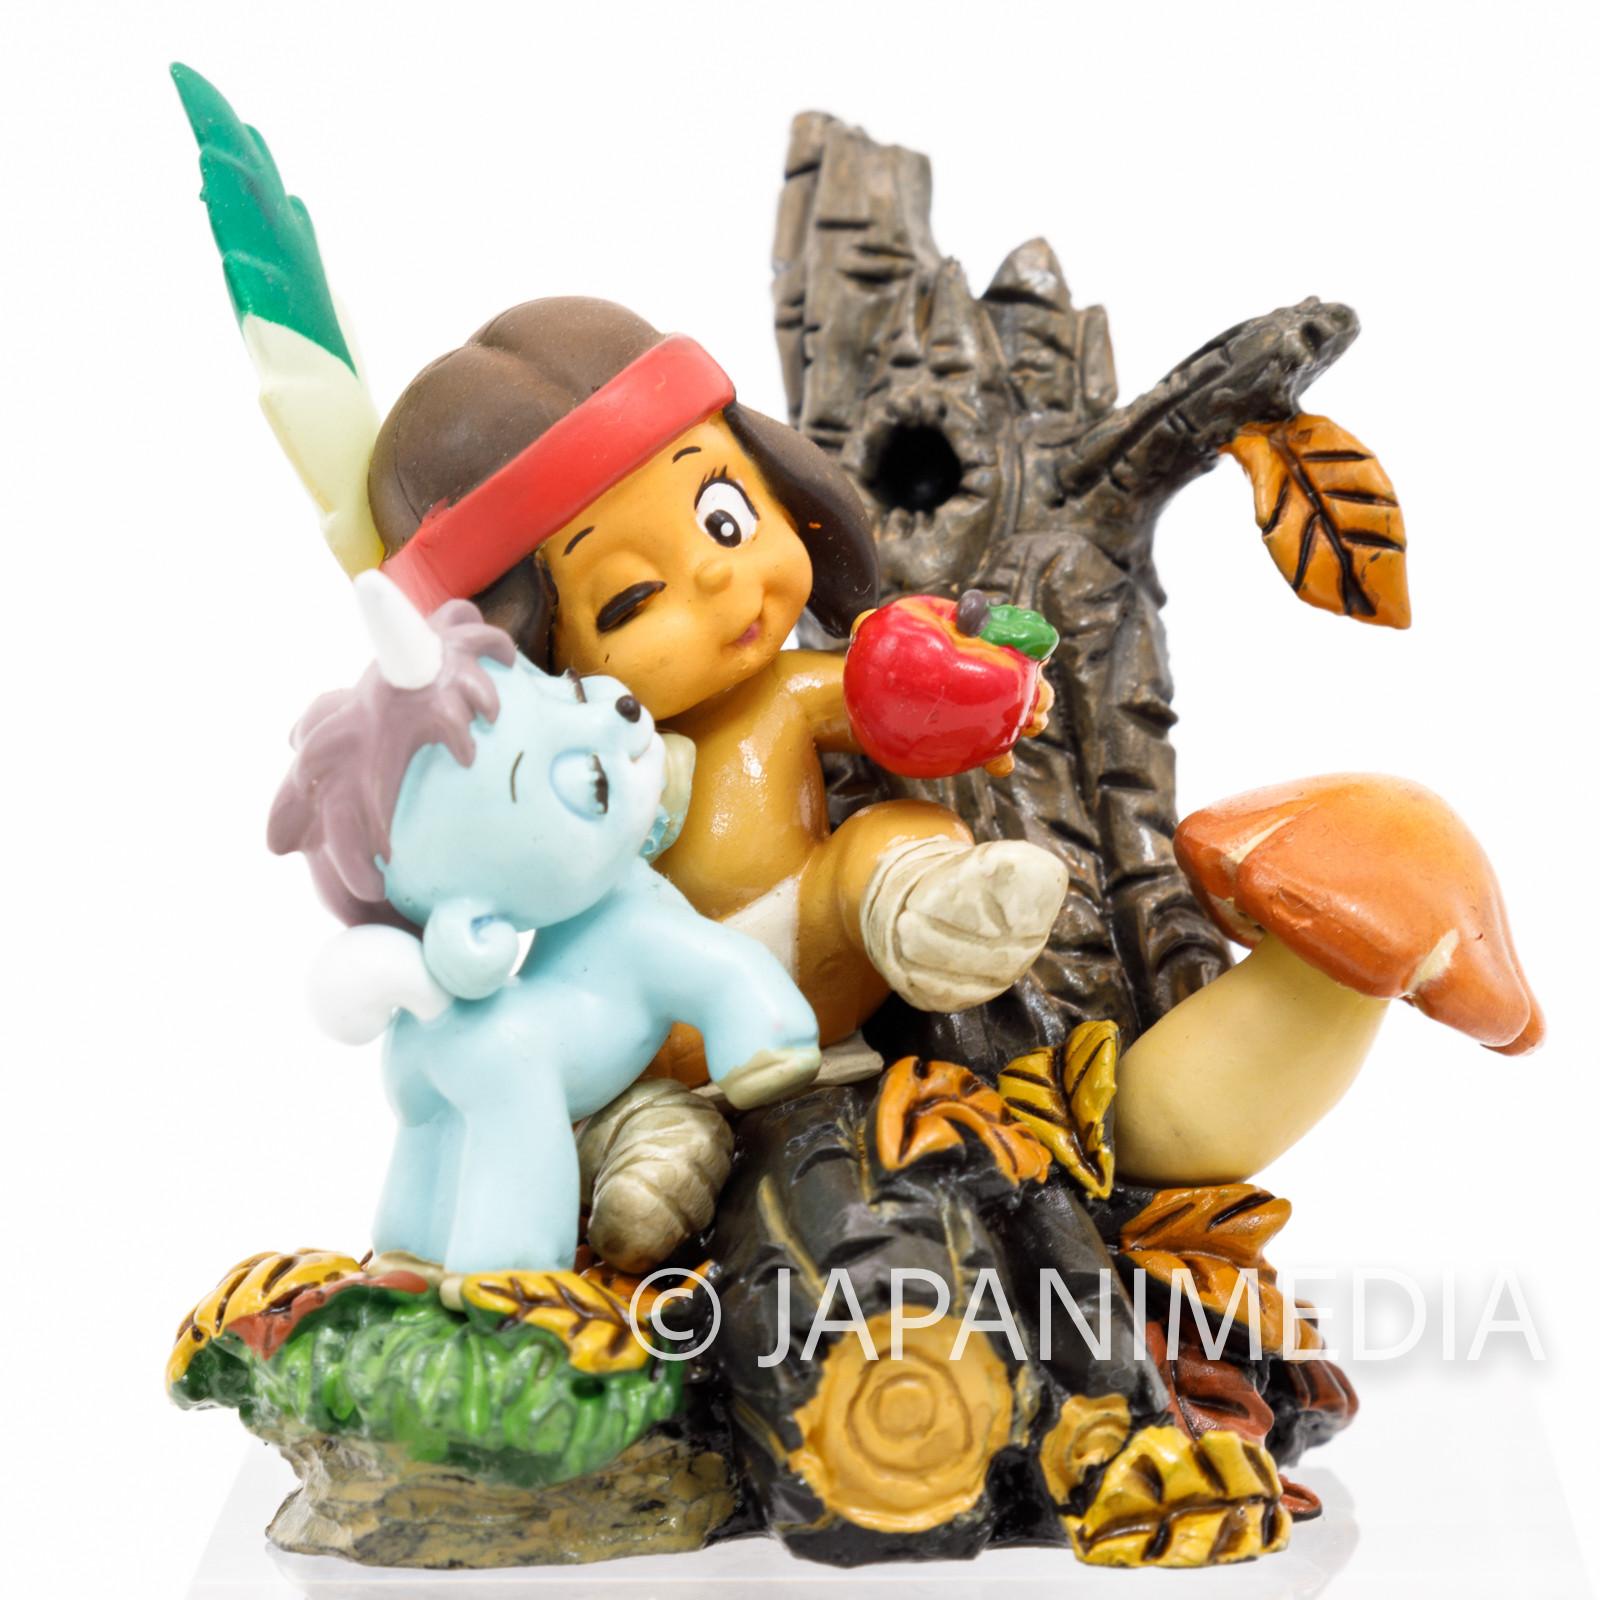 Unico Tezuka Osamu Mini Vignette Diorama Figure JAPAN ANIME MANGA